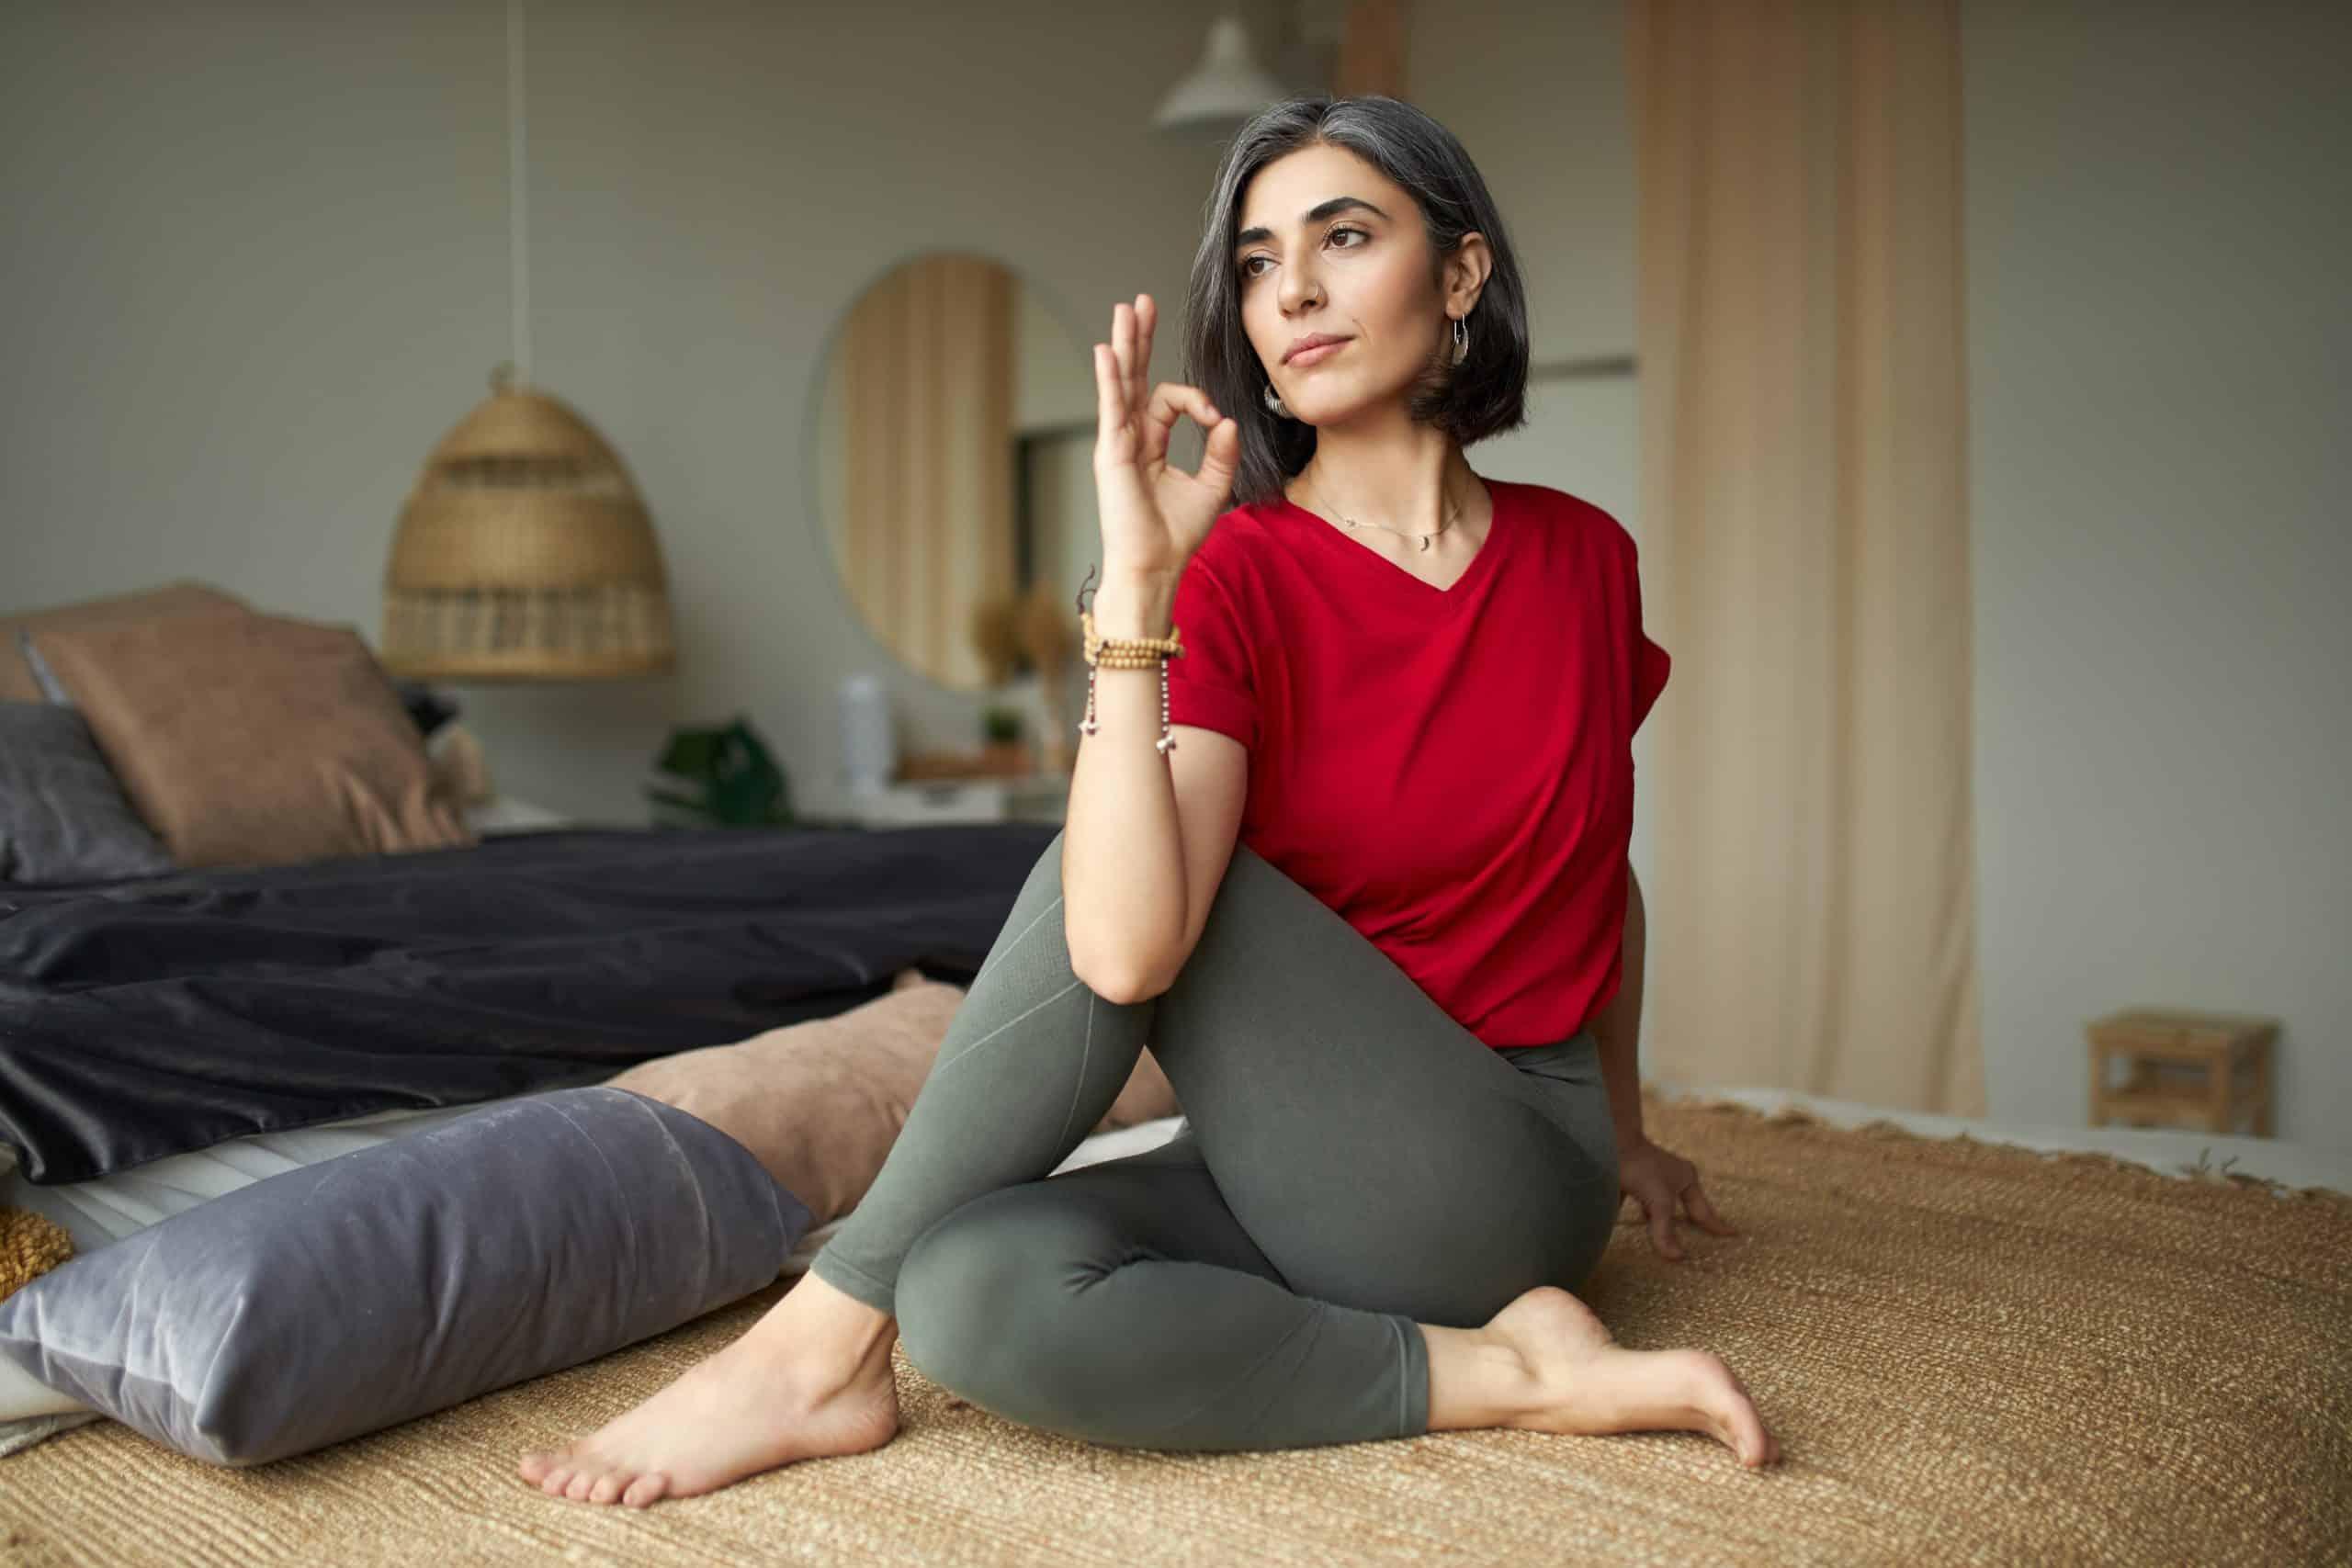 young woman practicing yoga ardha matsyendrasana